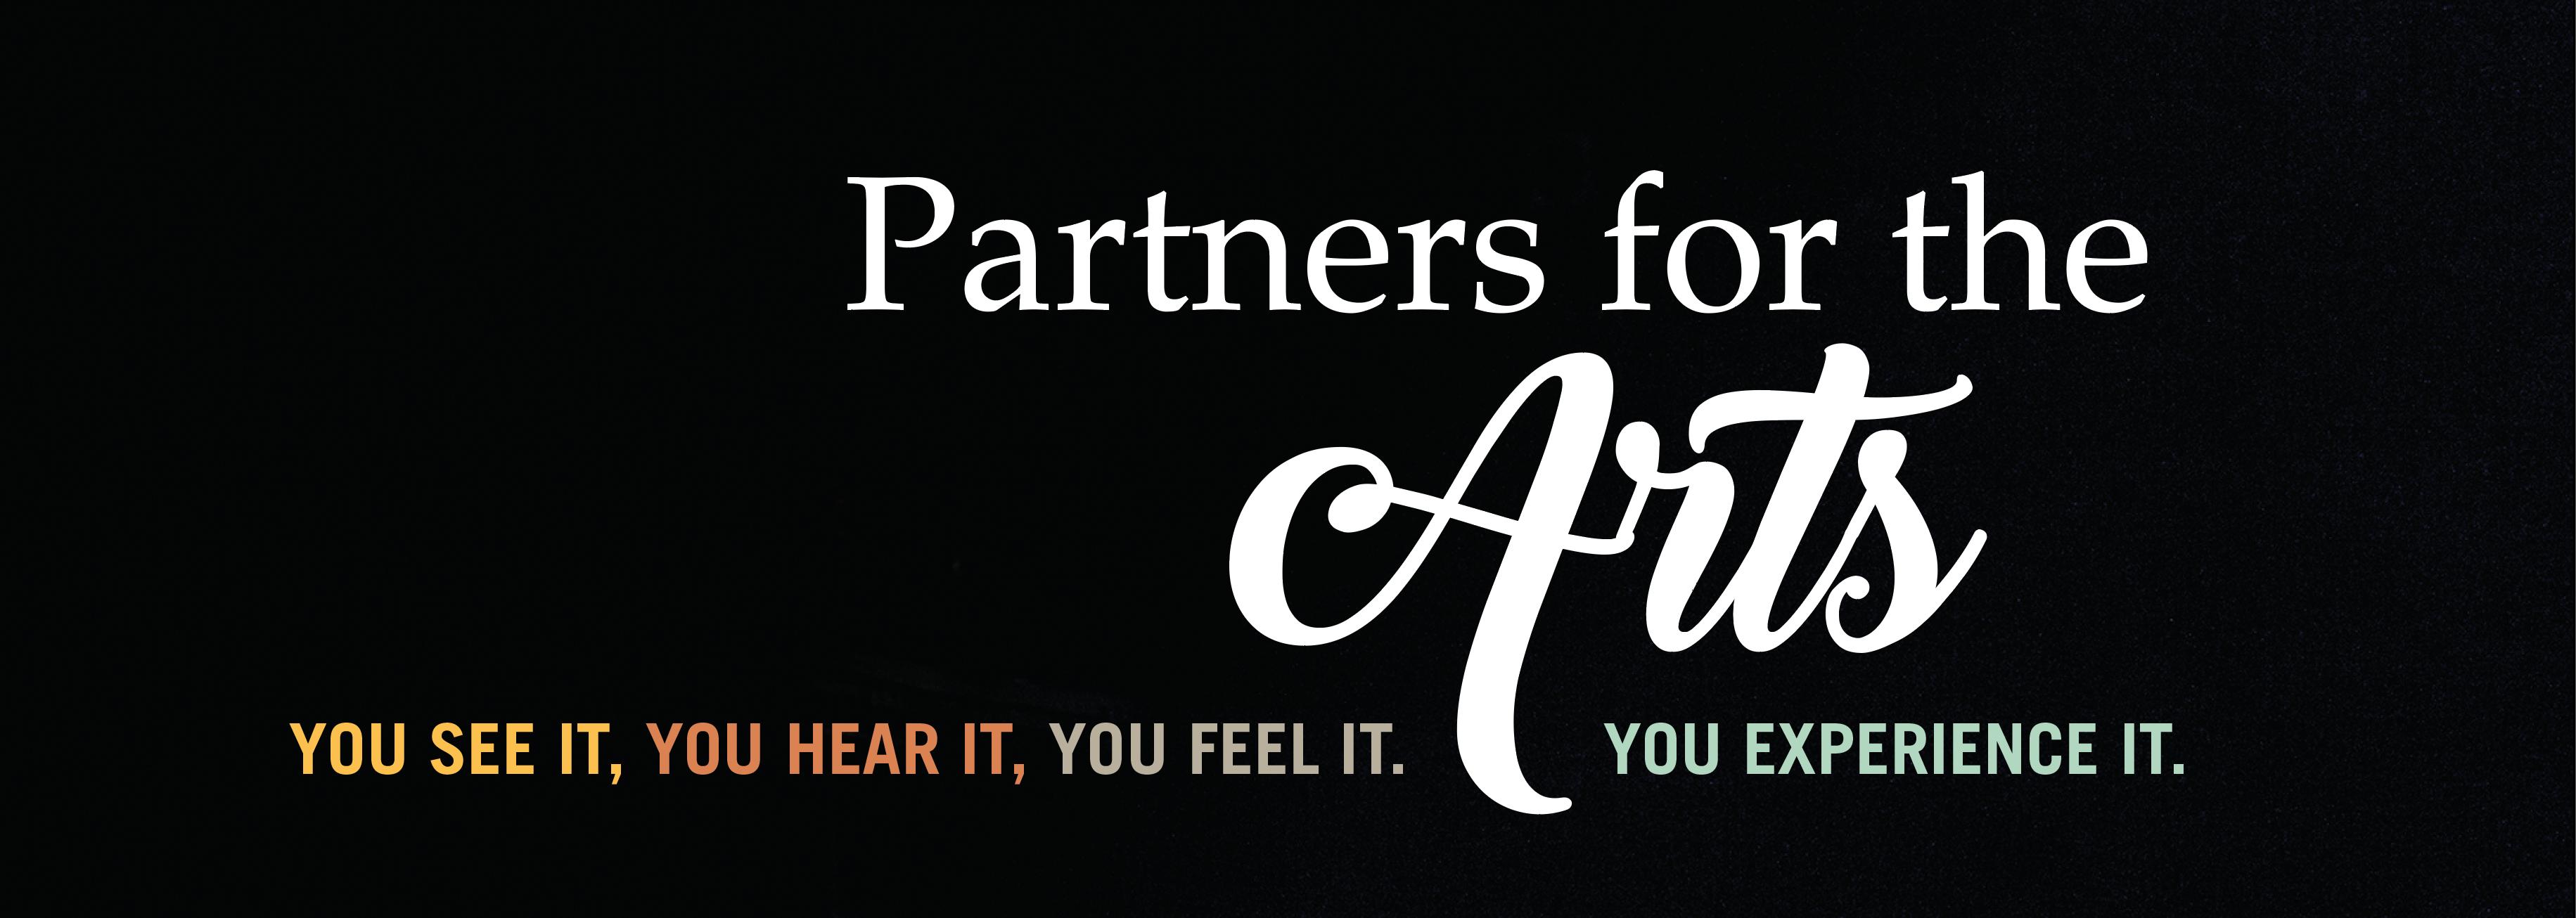 p-arts banner